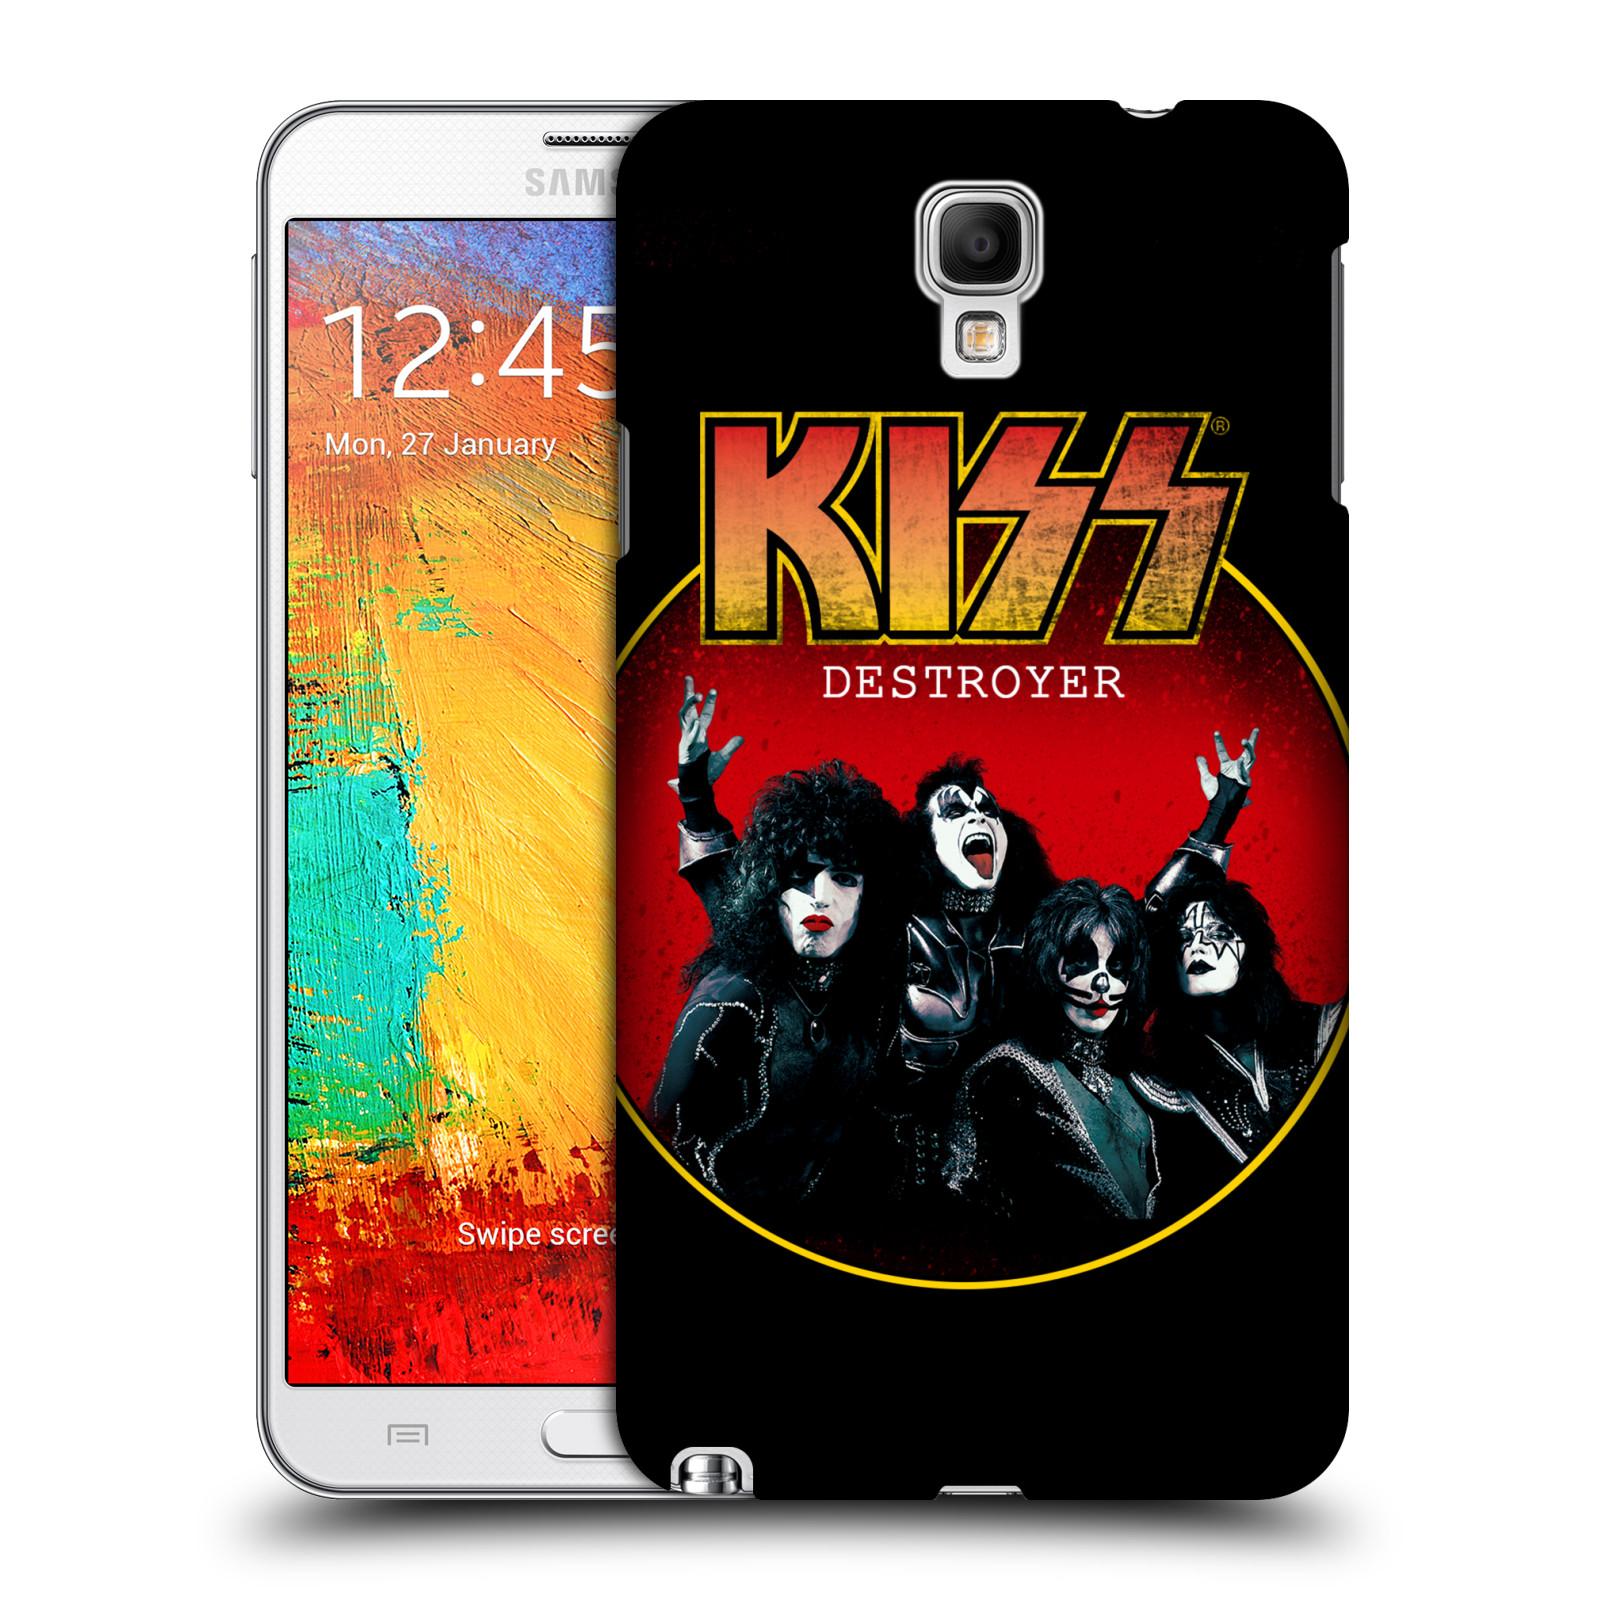 Plastové pouzdro na mobil Samsung Galaxy Note 3 Neo HEAD CASE - Kiss - Destroyer